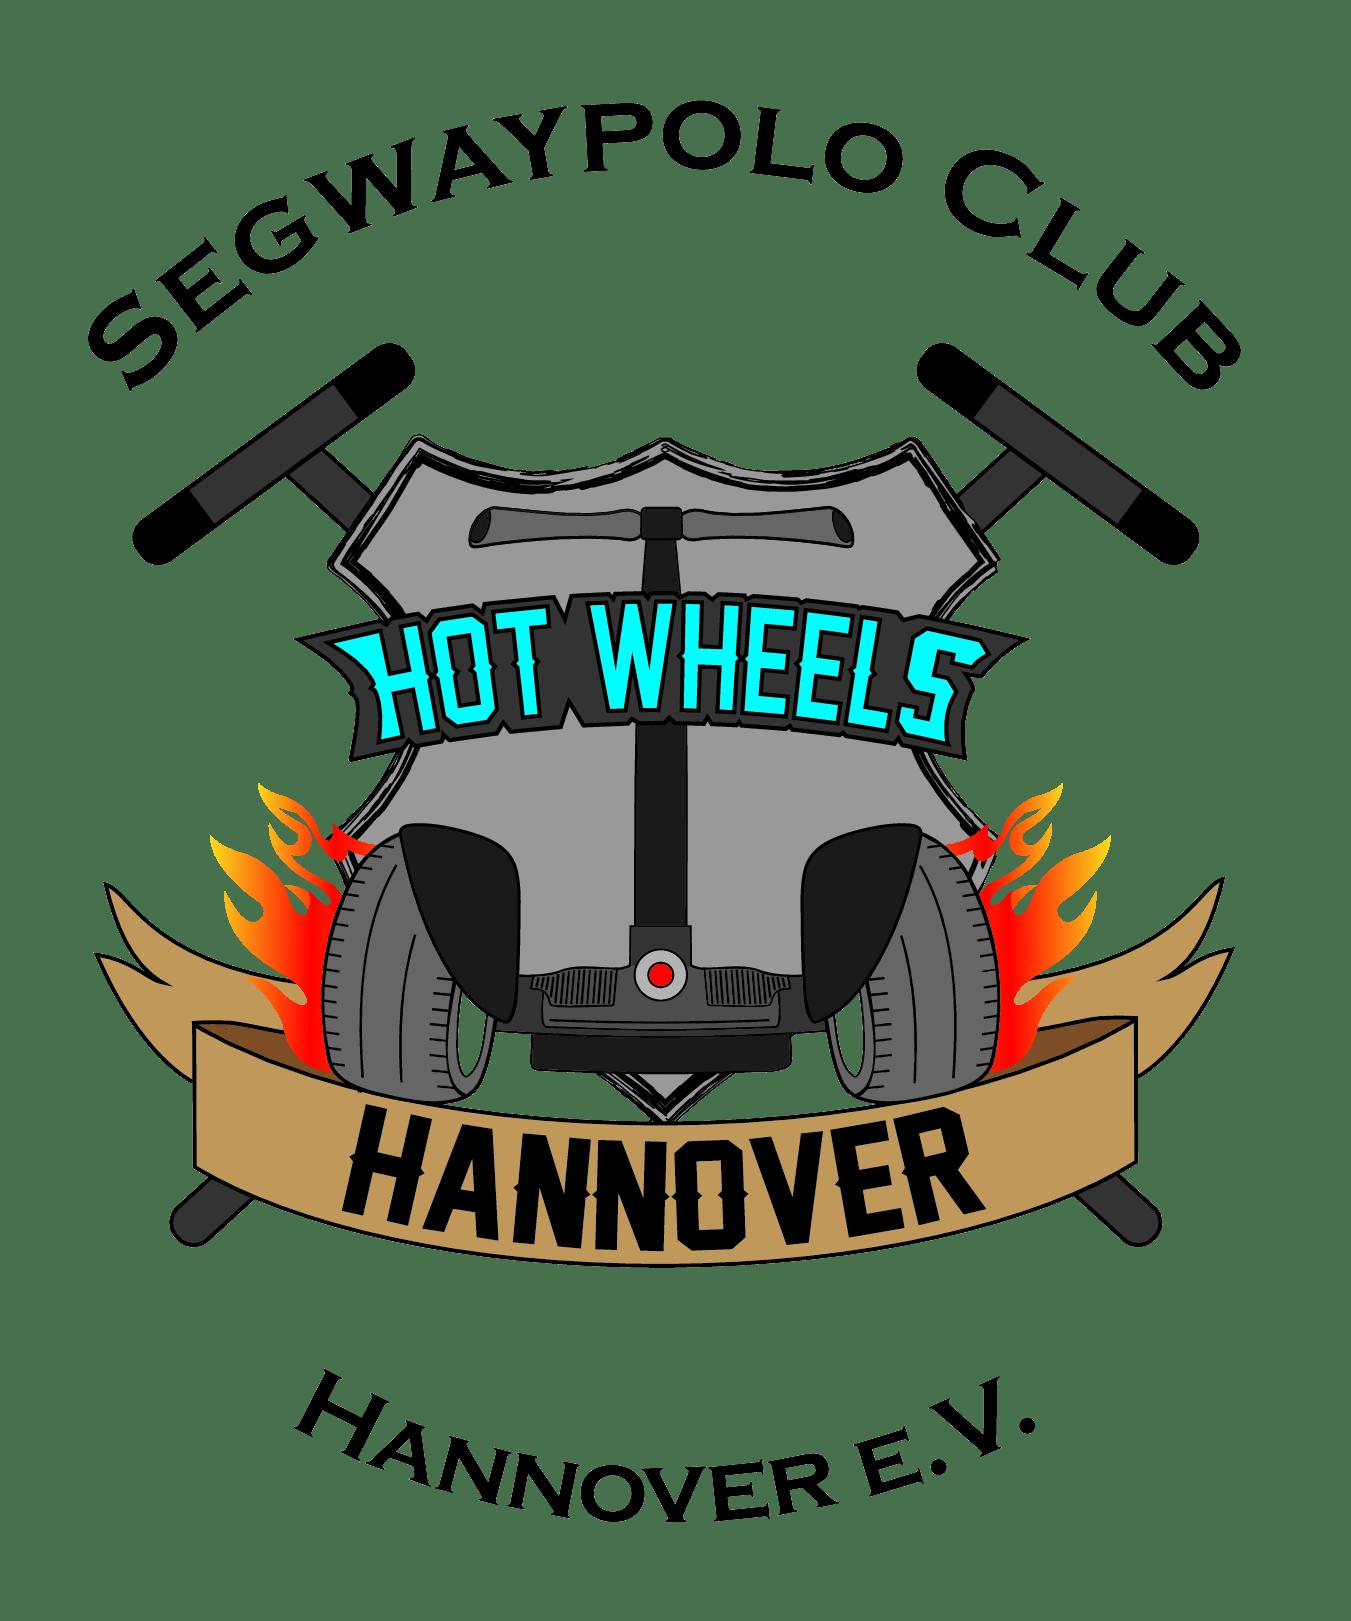 Segwaypolo Club Hannover e.V.